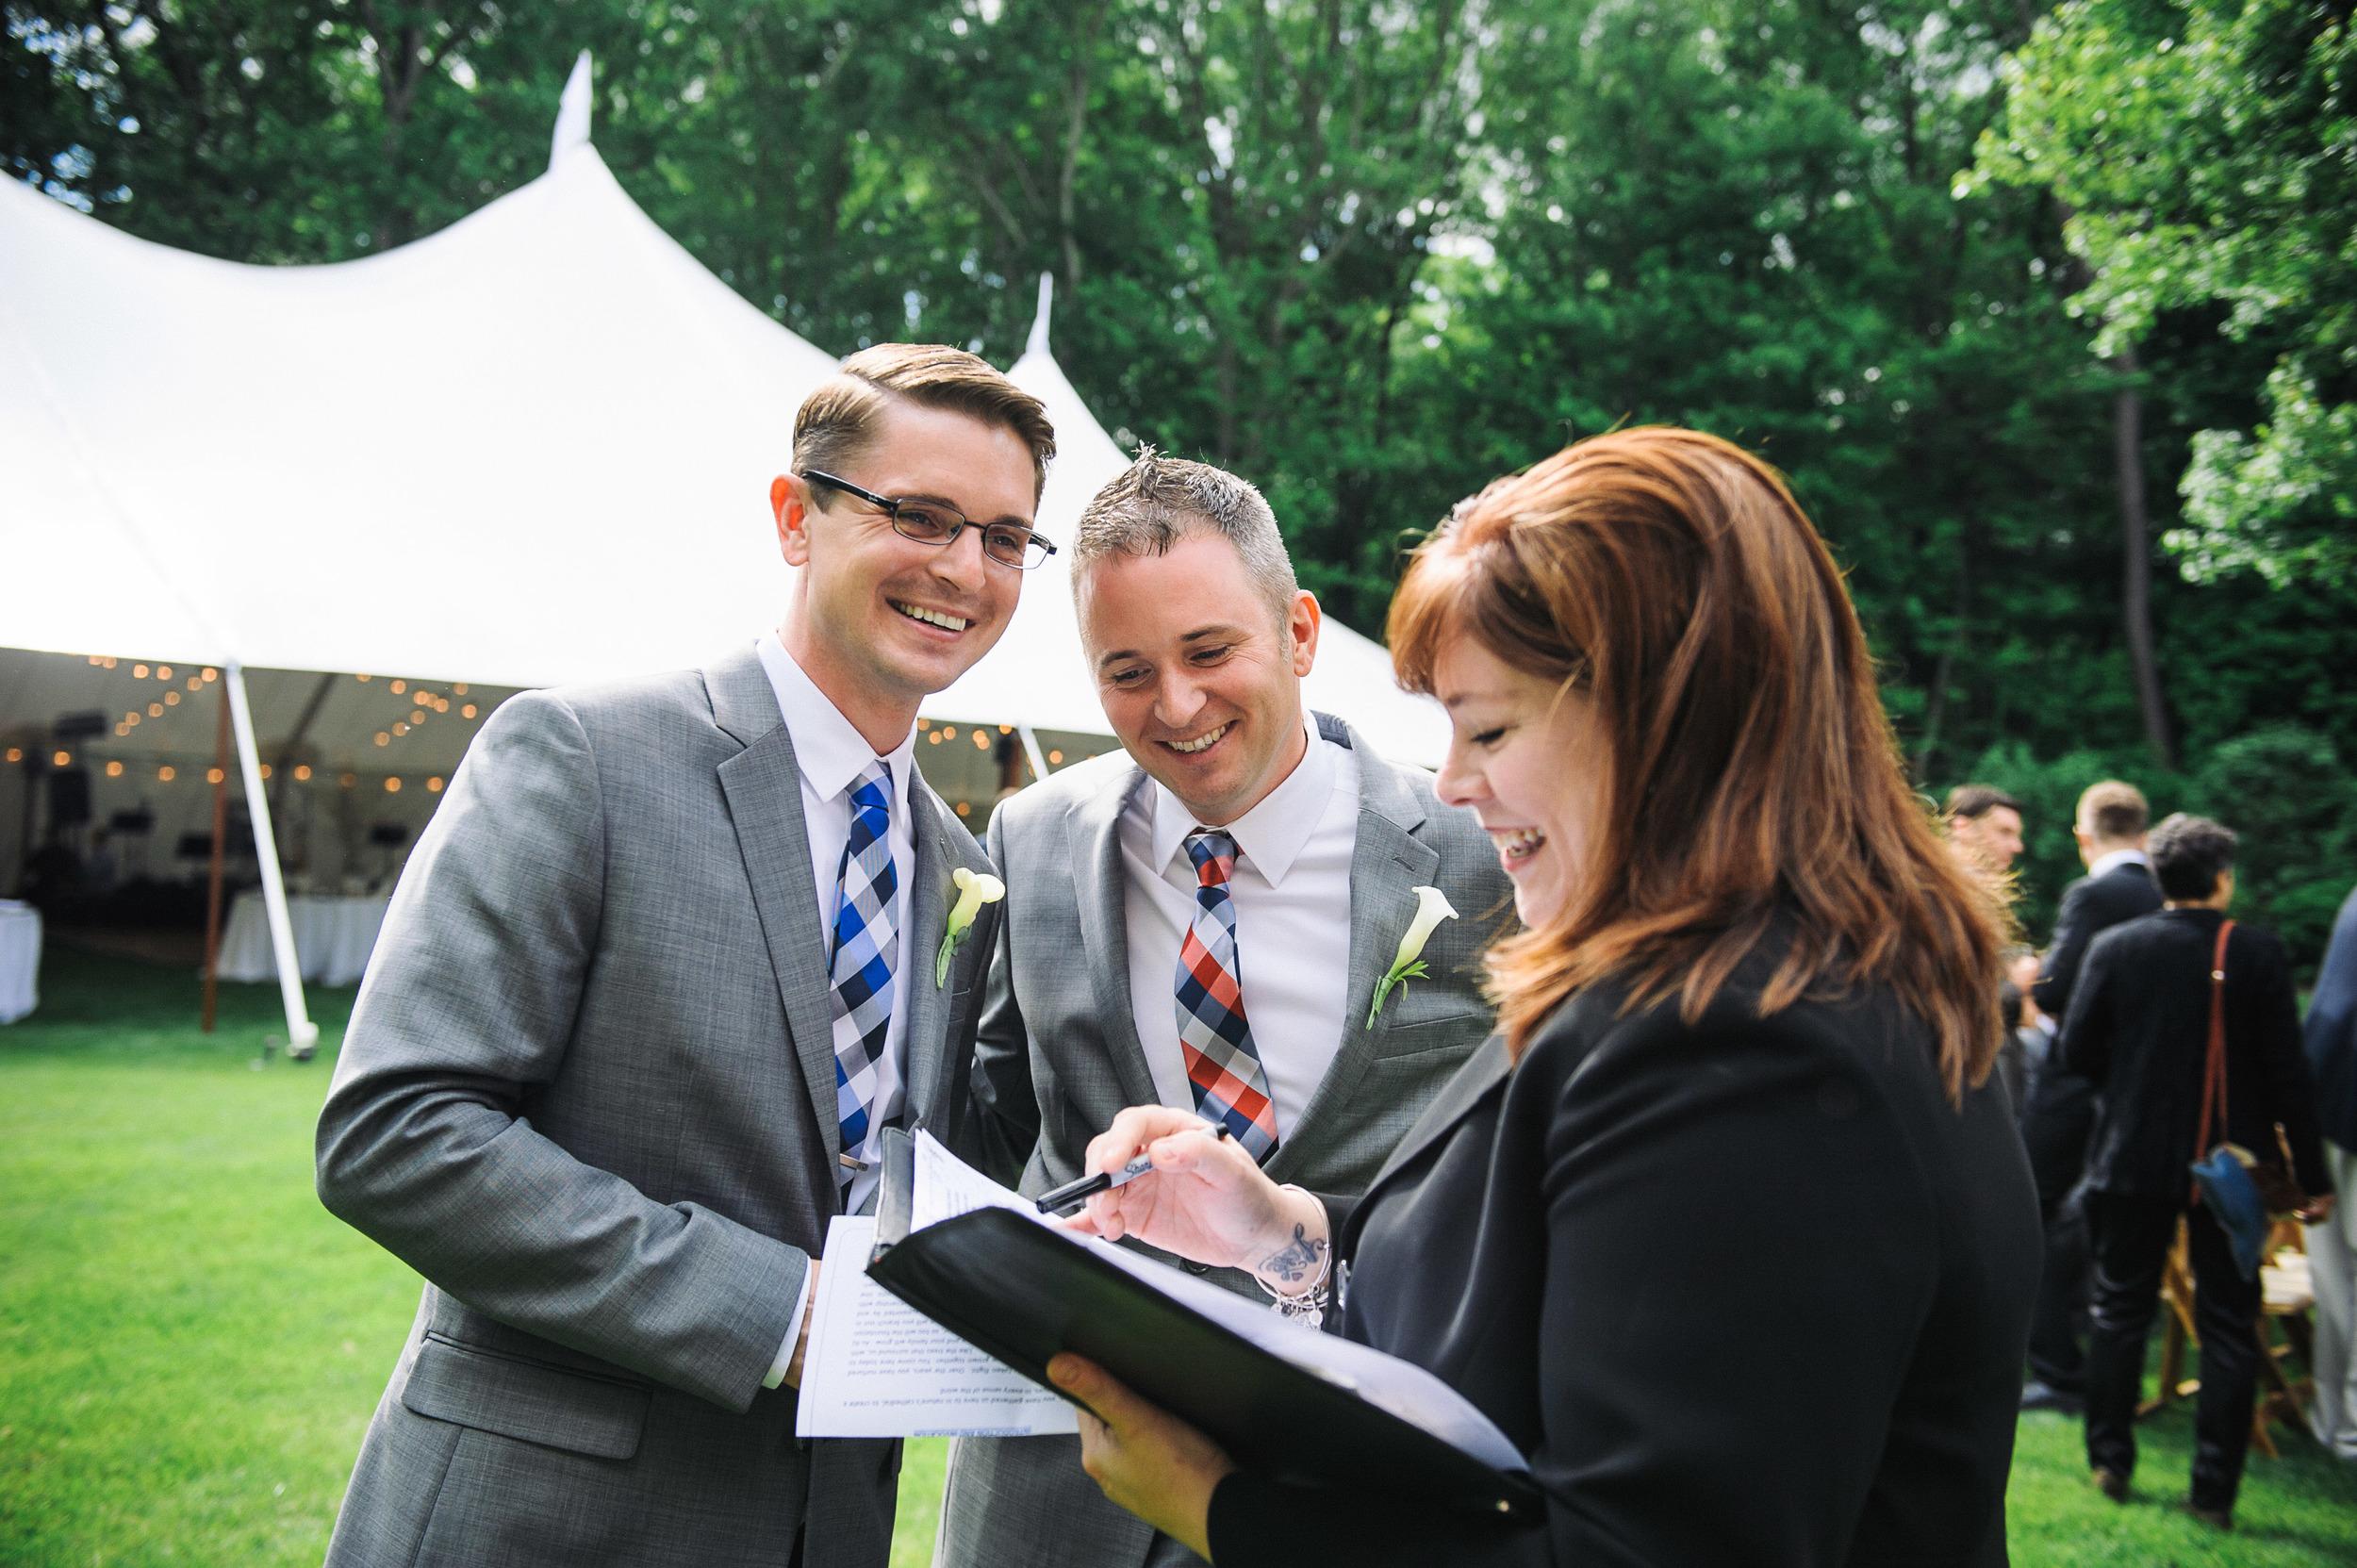 Same Sex Wedding CT Gay Wedding LGBT Wedding035.JPG